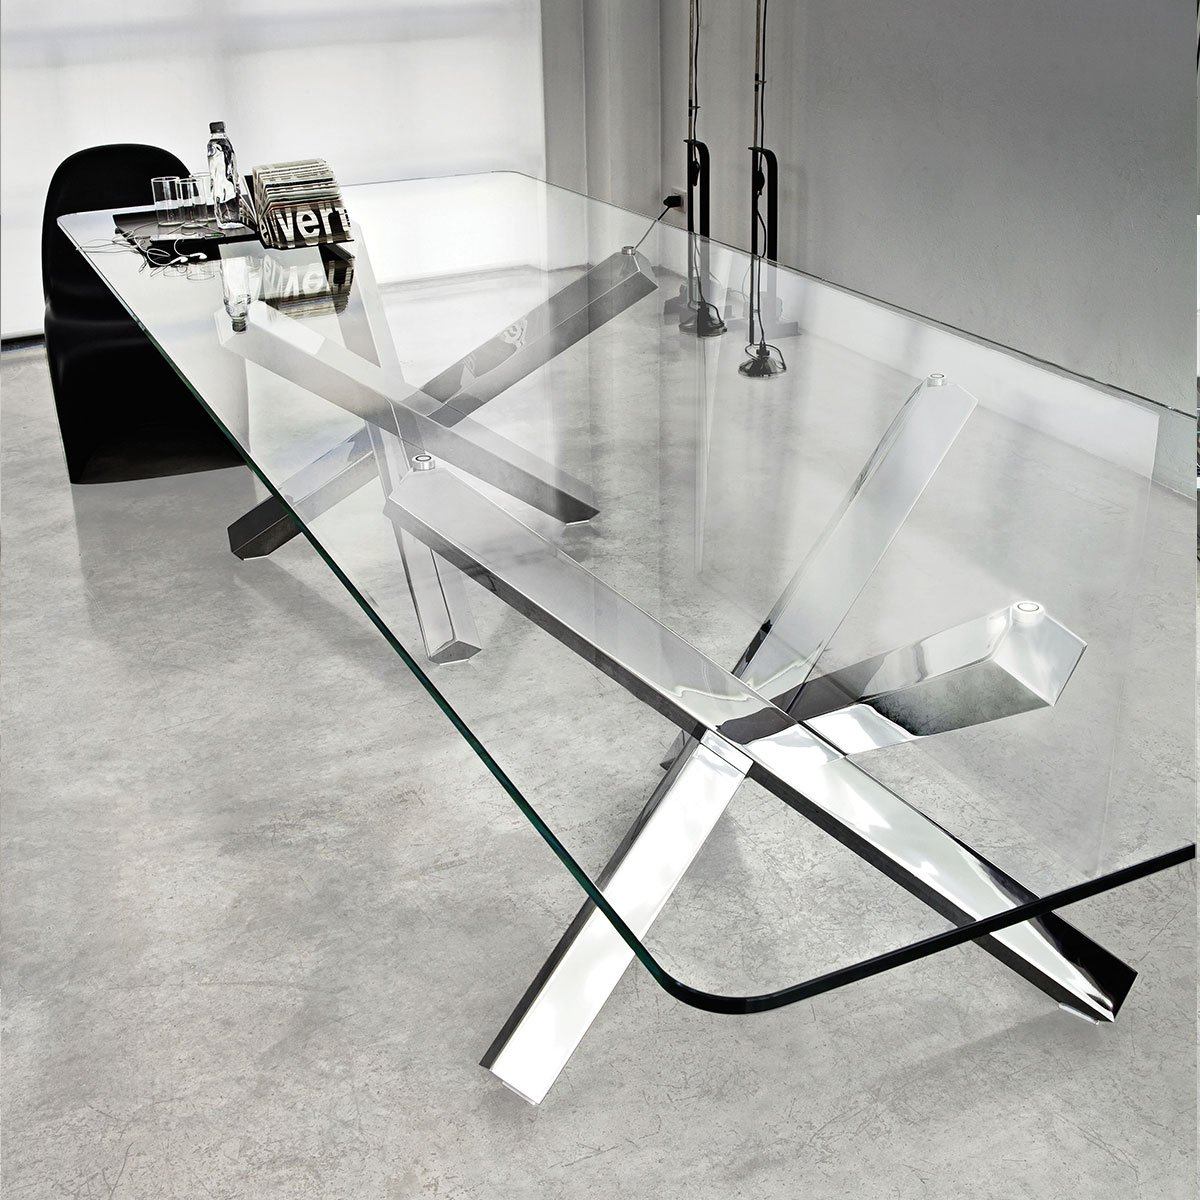 klarity  glass furniture shop  glass dining tables  wood  glass diningtables  aikido large glass dining table. aikido large glass dining table  klarity glass furniture